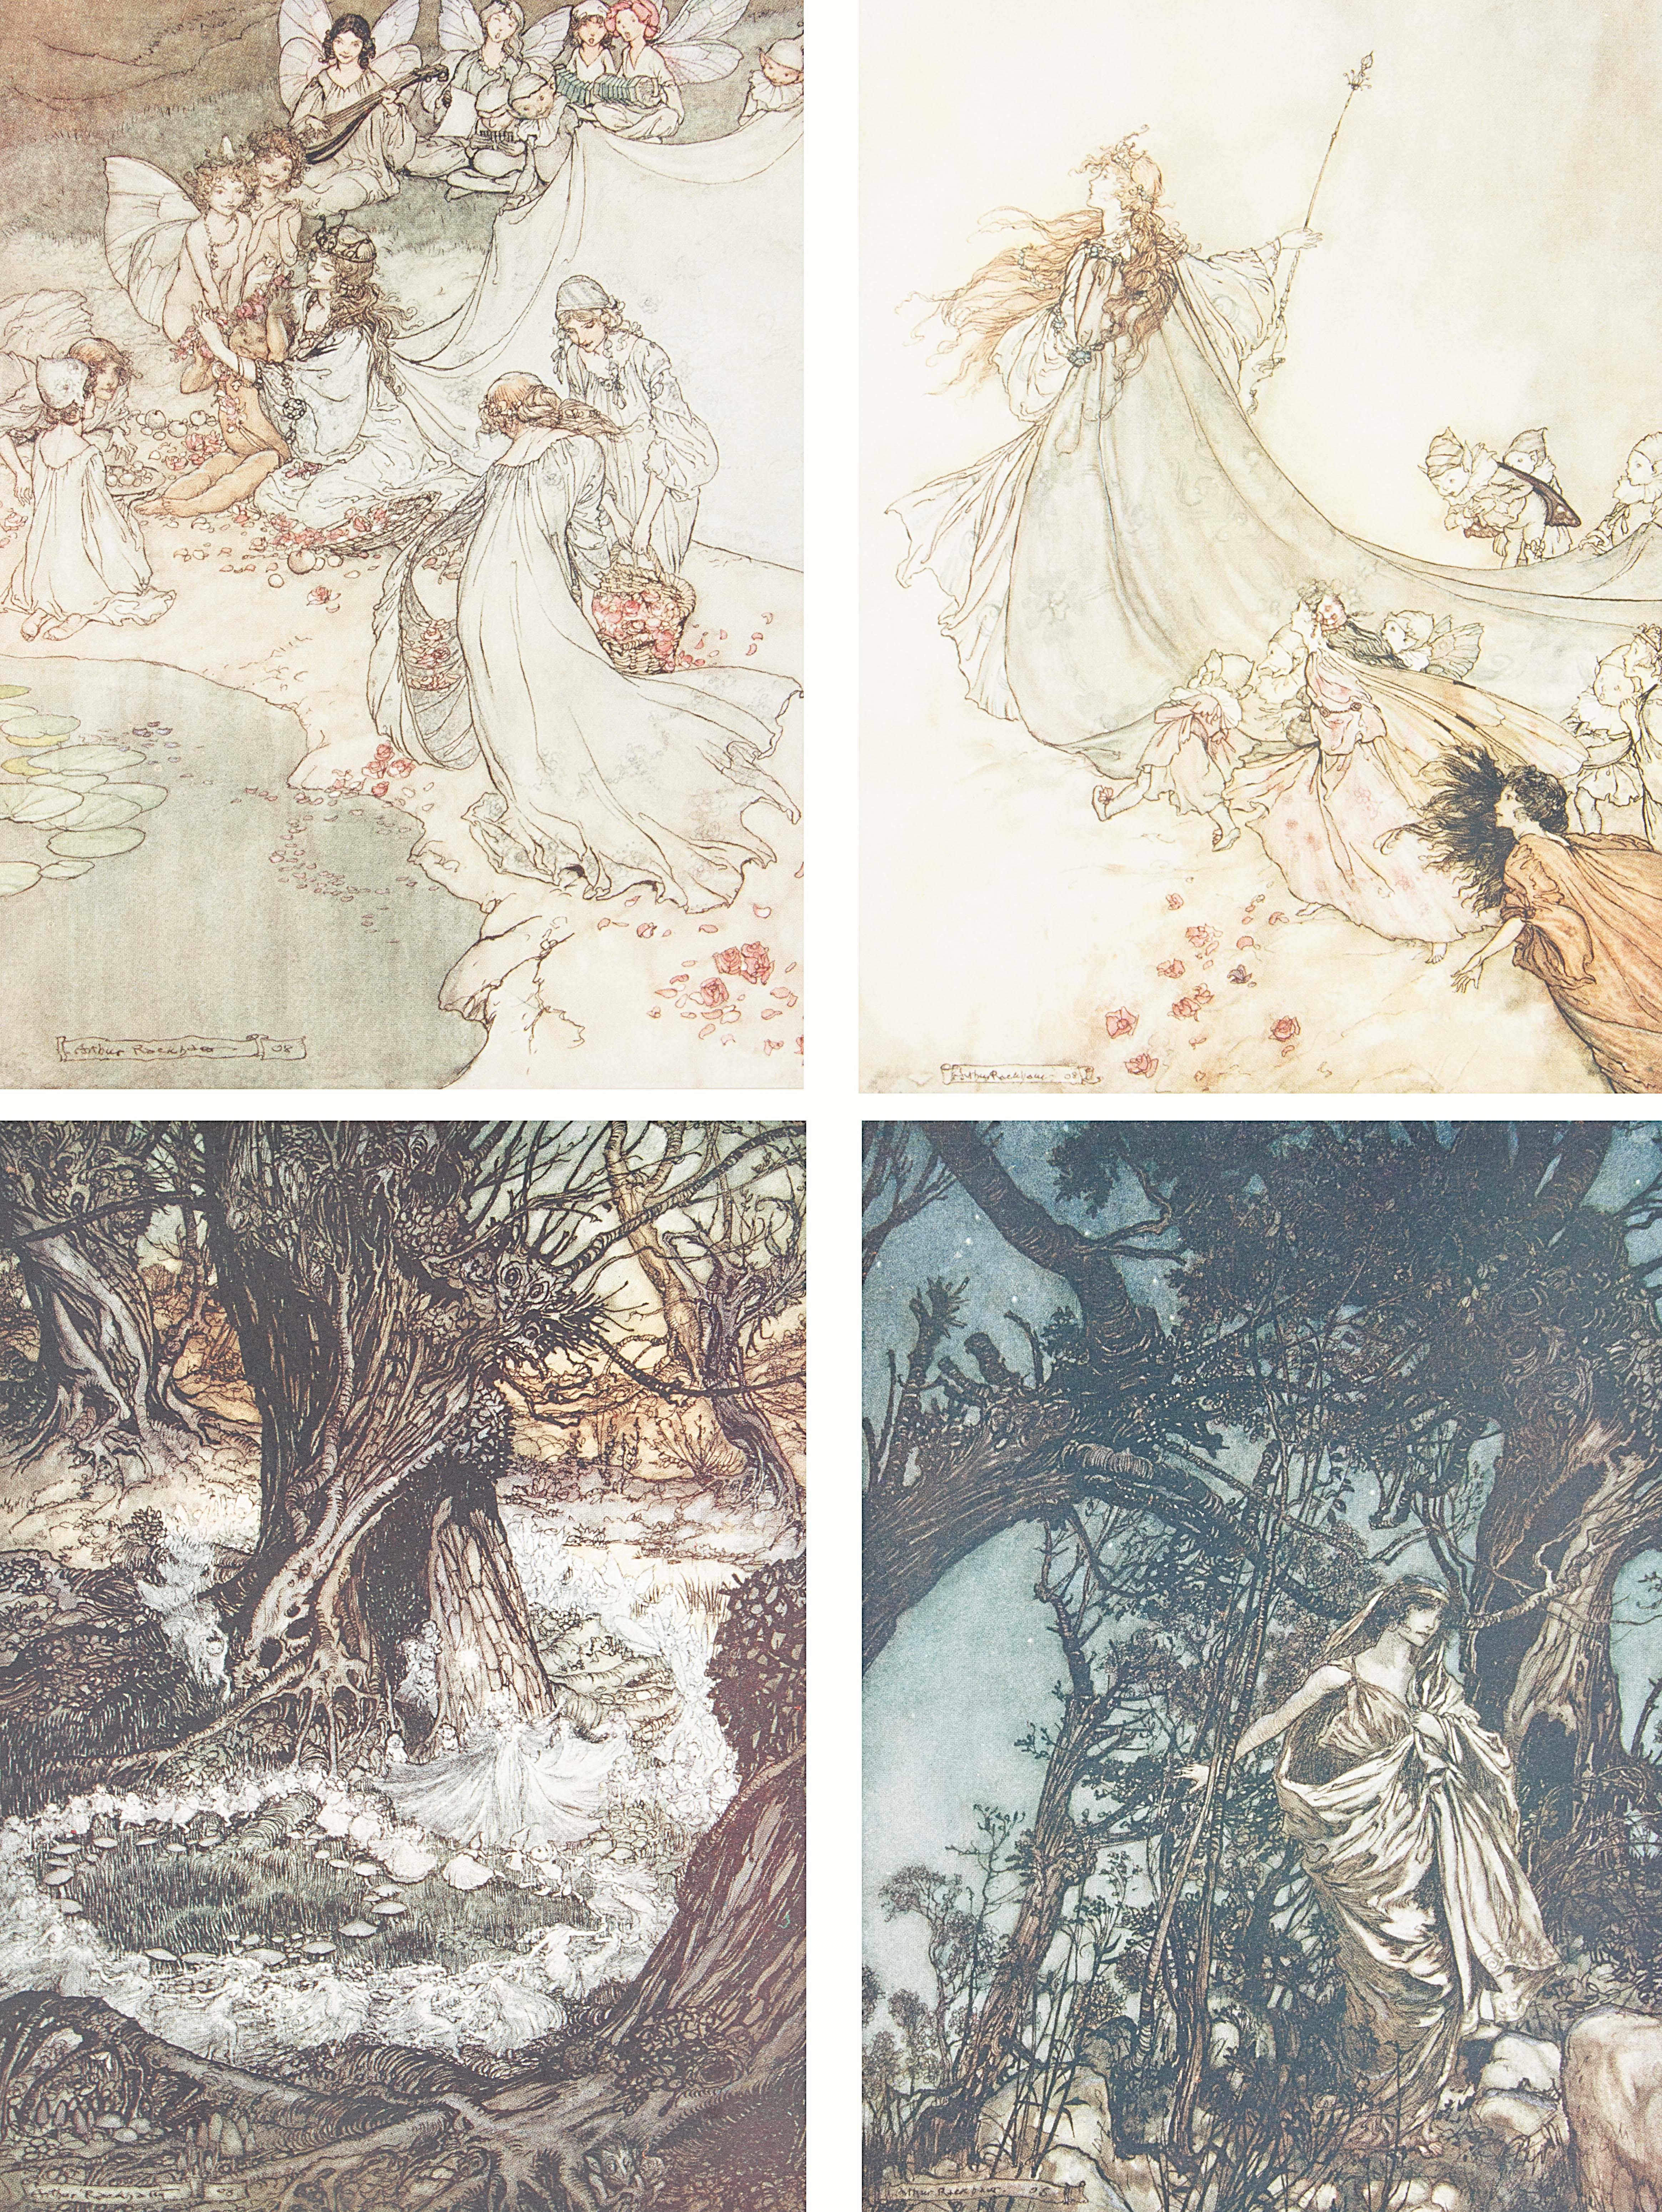 1908 MIDSUMMER NIGHT'S DREAM BY WILLIAM SHAKESPEARE, ILLUSTRATIONS BY ARTHUR RACKHAM - Image 5 of 7